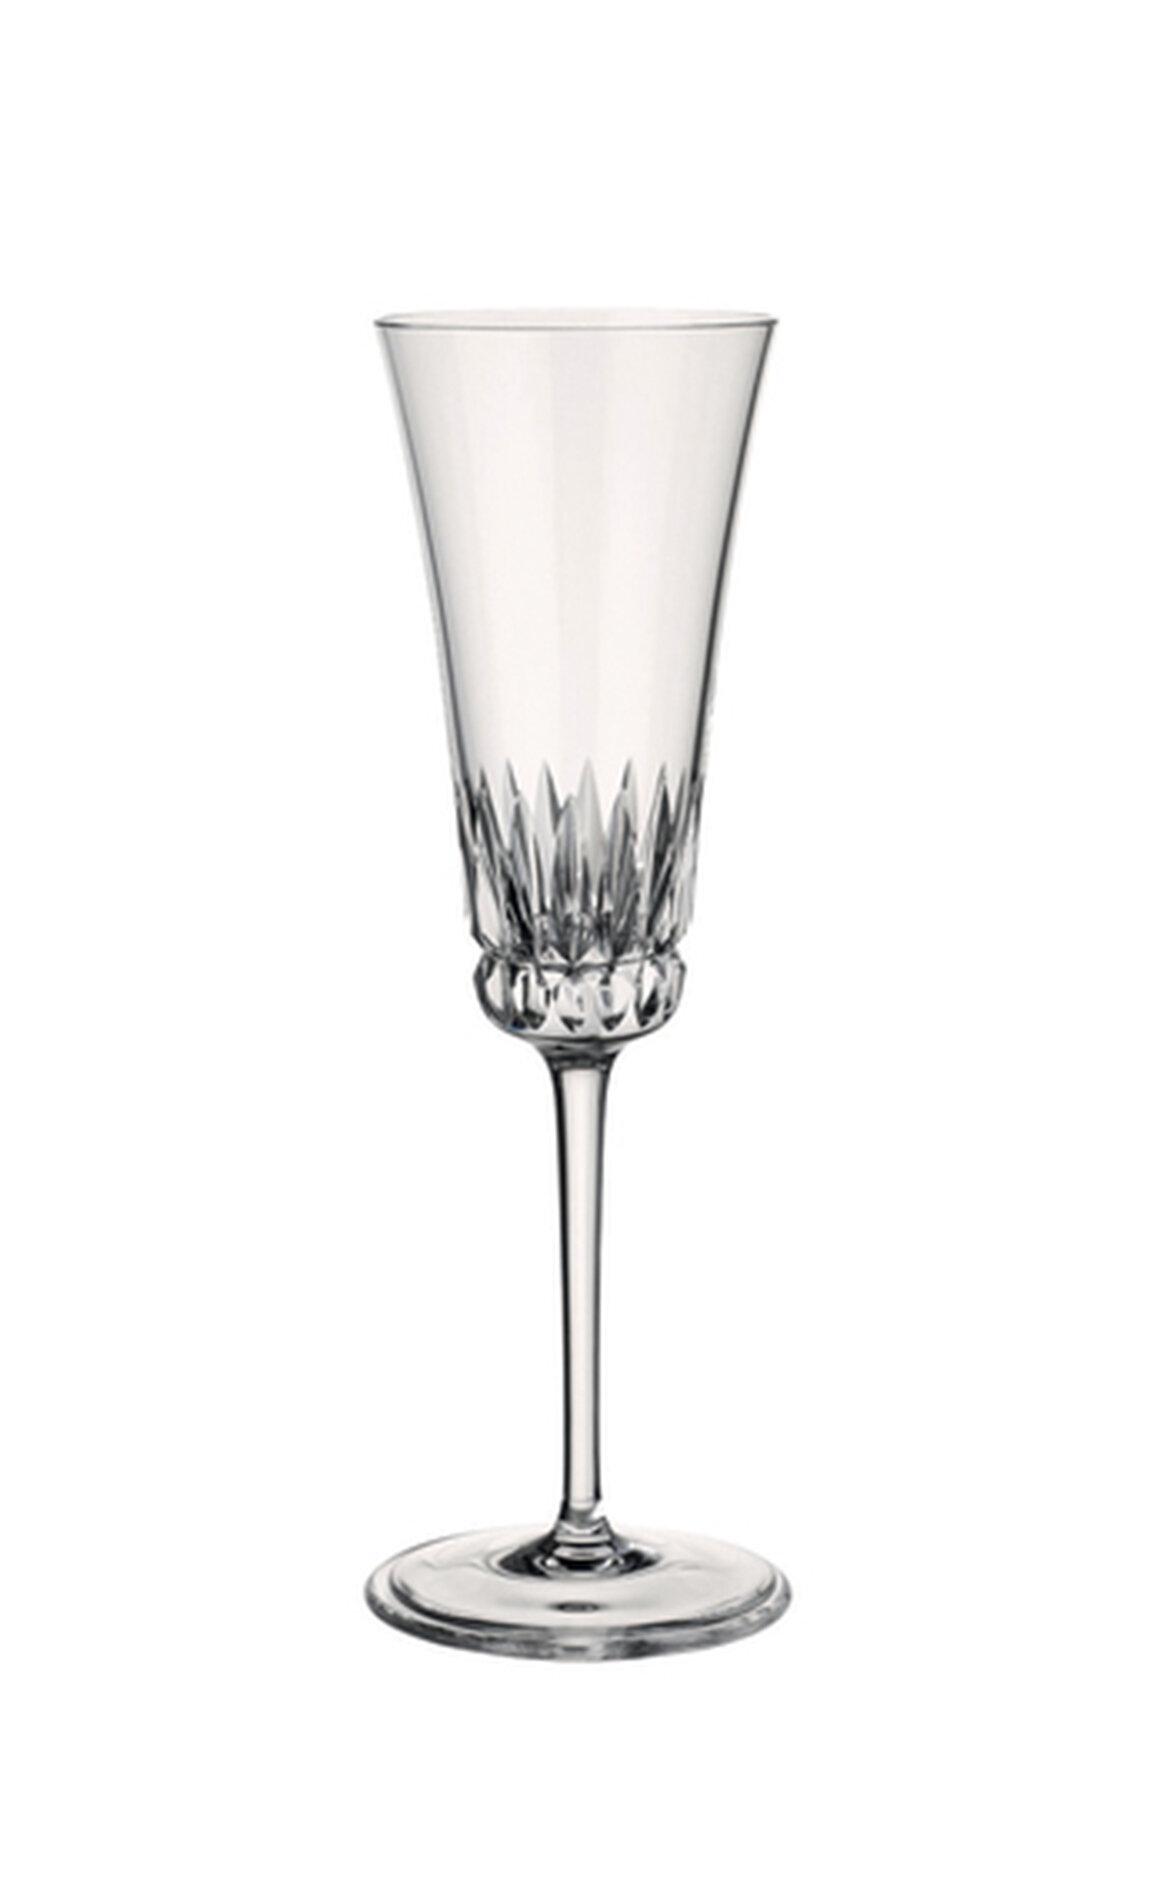 Villeroy & Boch-Villeroy & Boch Grand Royal  Şampanya Kadehi